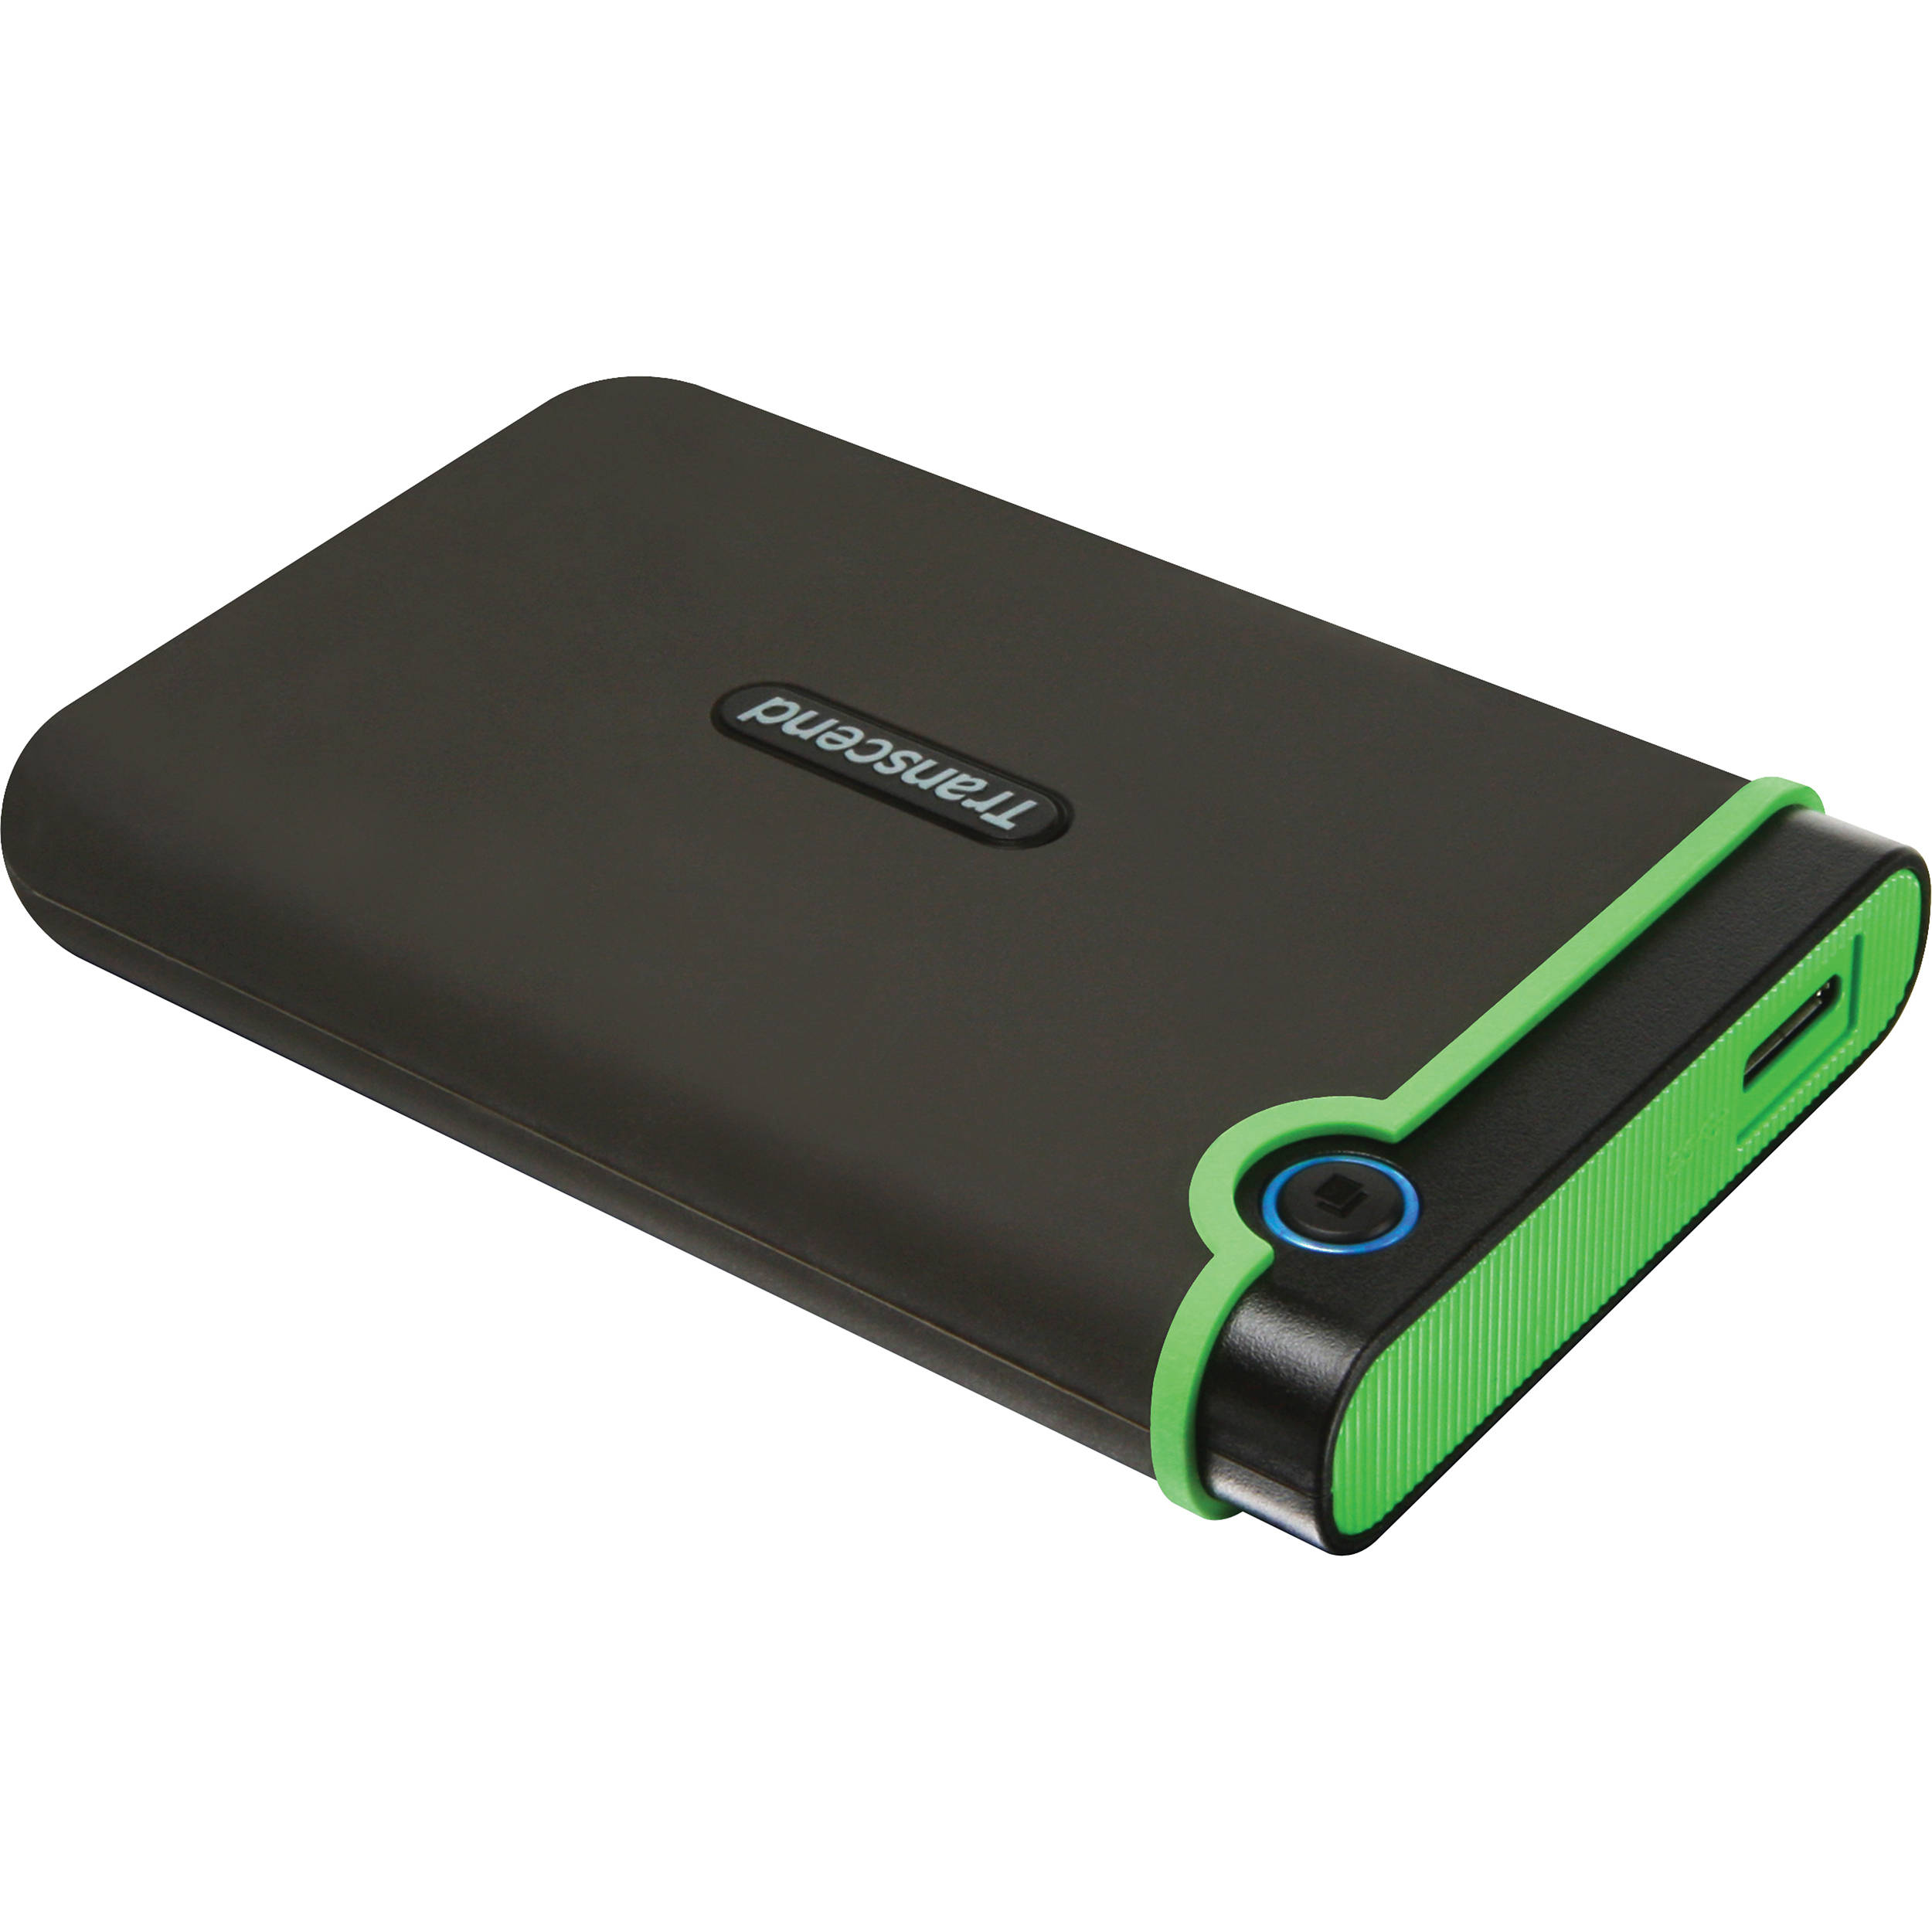 Transcend StoreJet 25M3 portable hard drive review